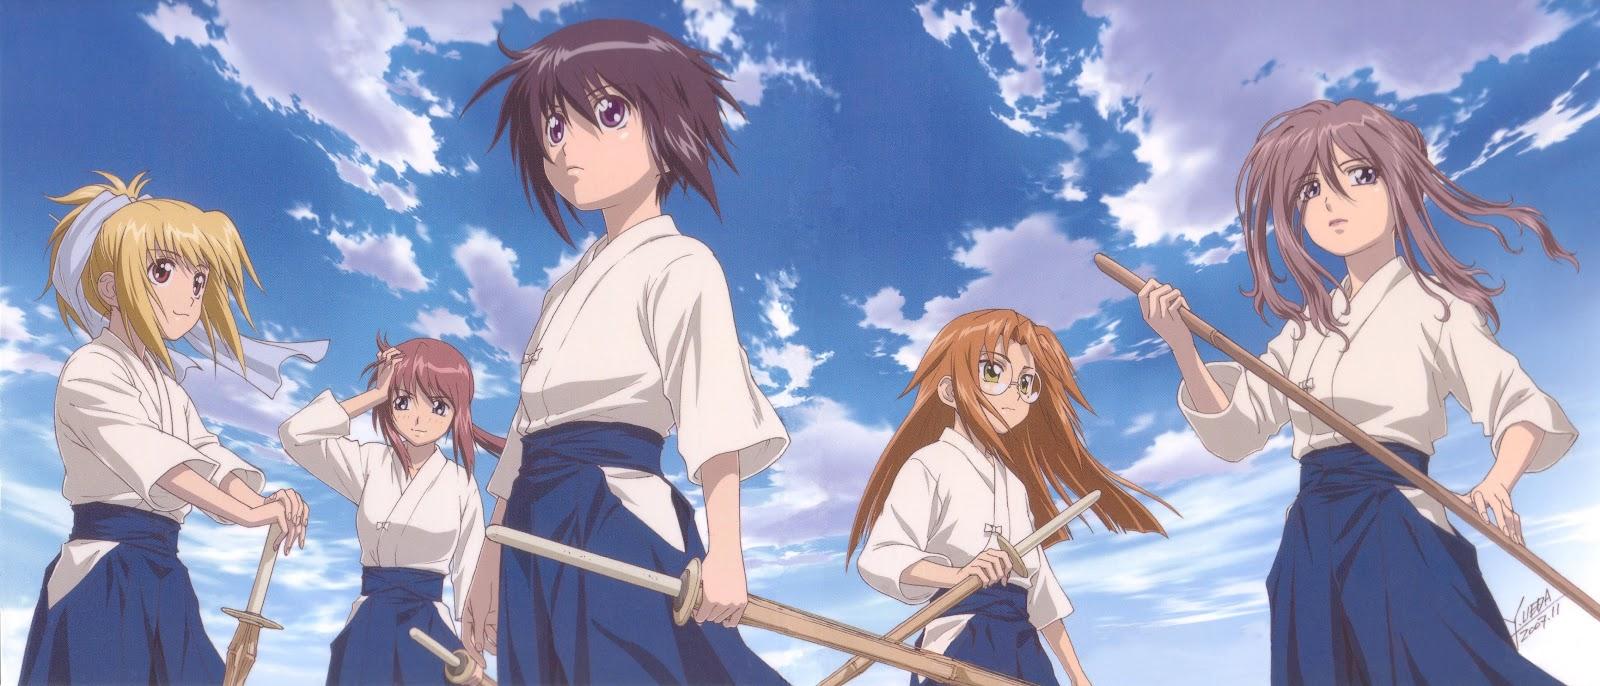 Kendo sword anime